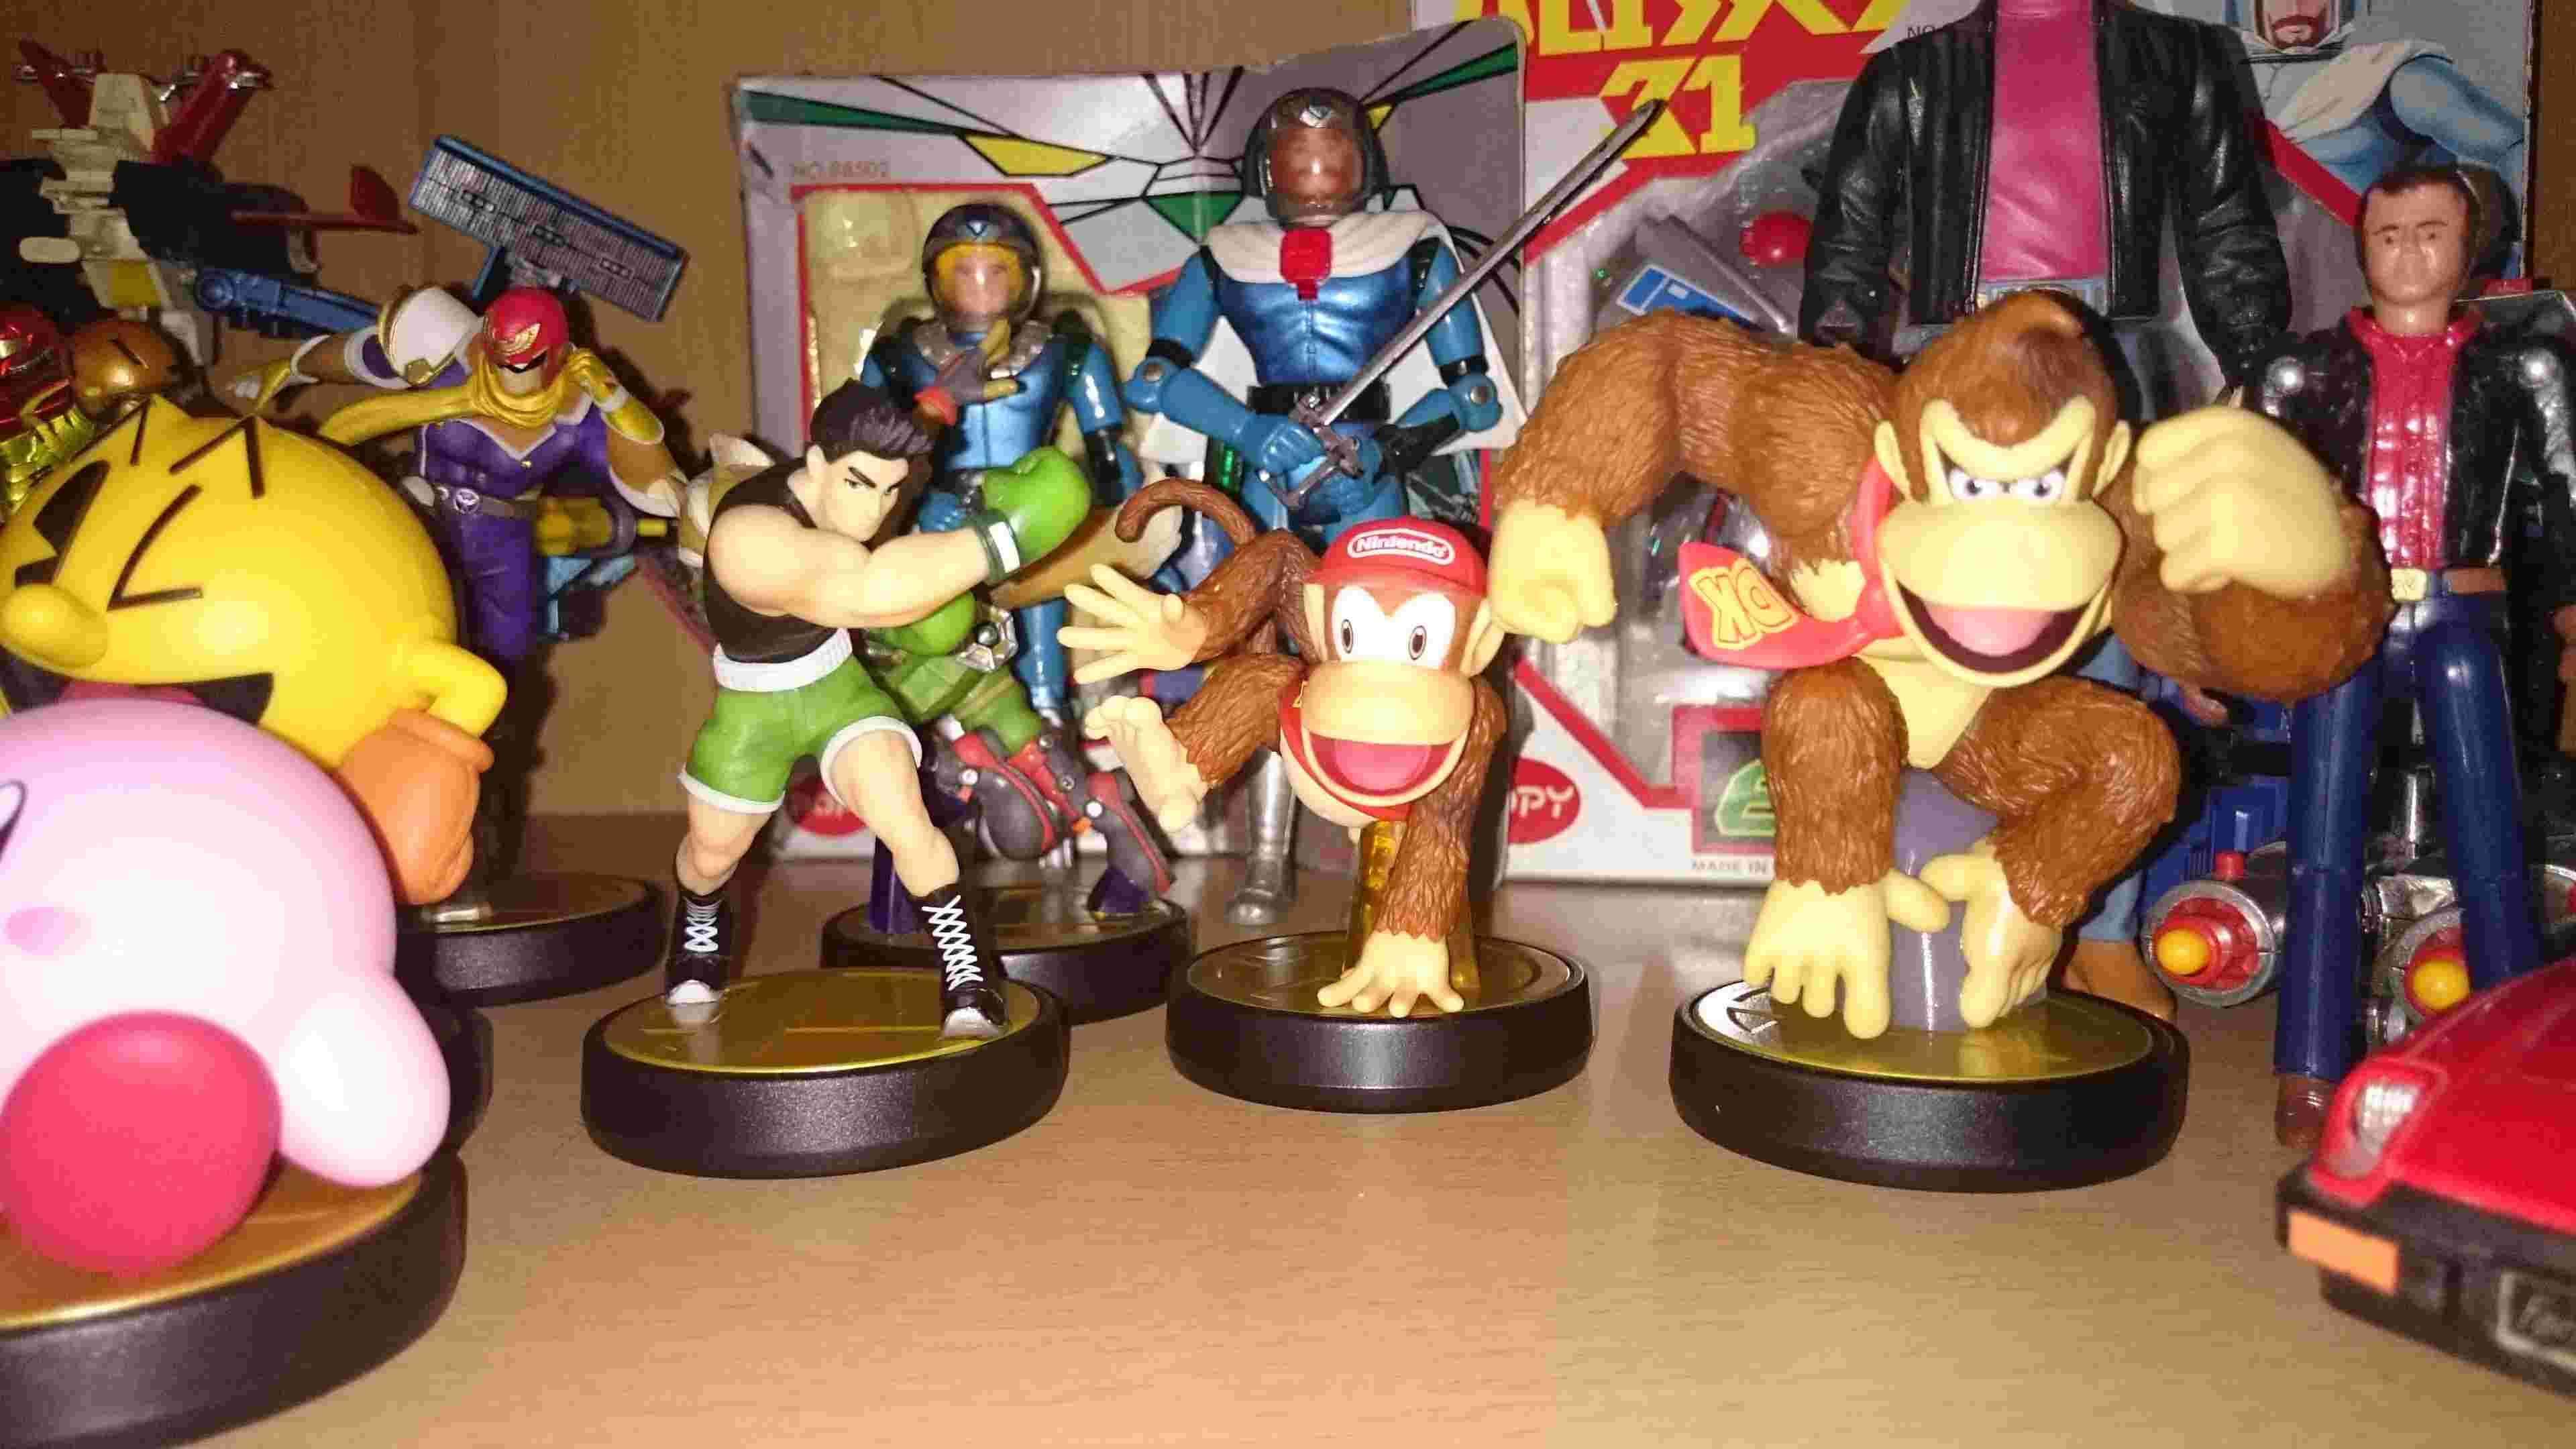 Postez vos photos figurines Nintendo WiiU Amiibo ! Amiibo12